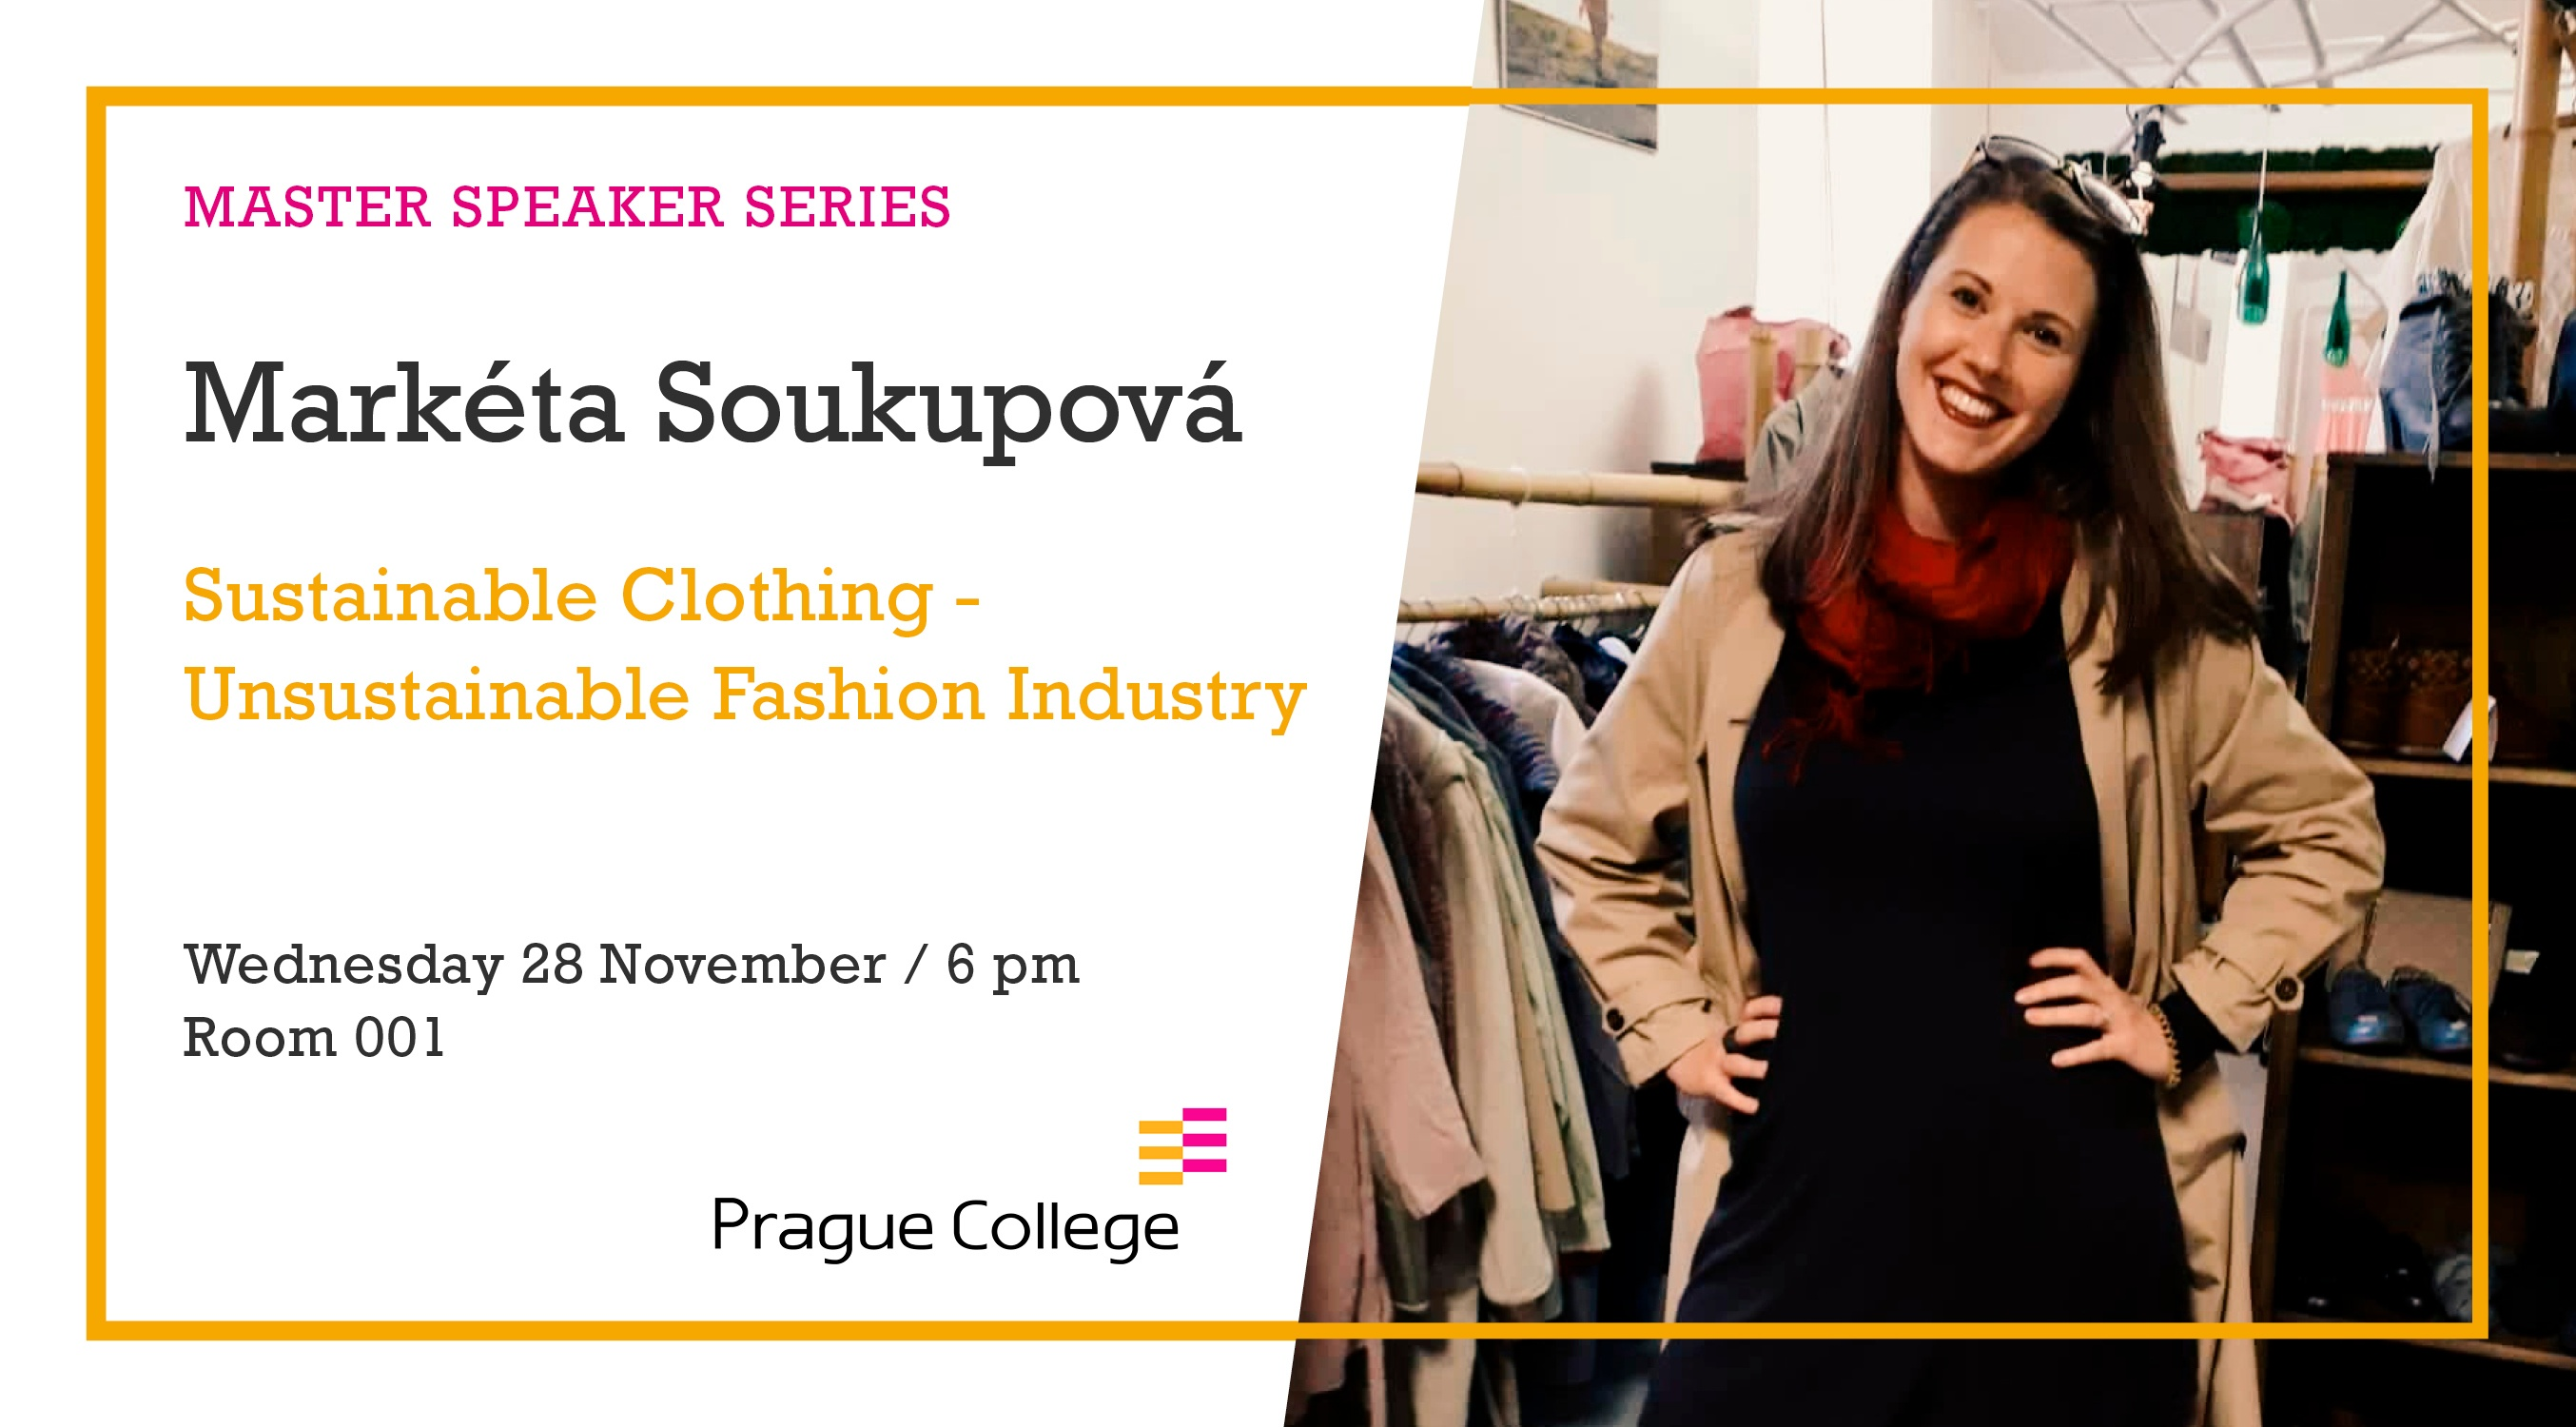 Master Speaker Series: Sustainable Clothing - Unsustainable Fashion Industry